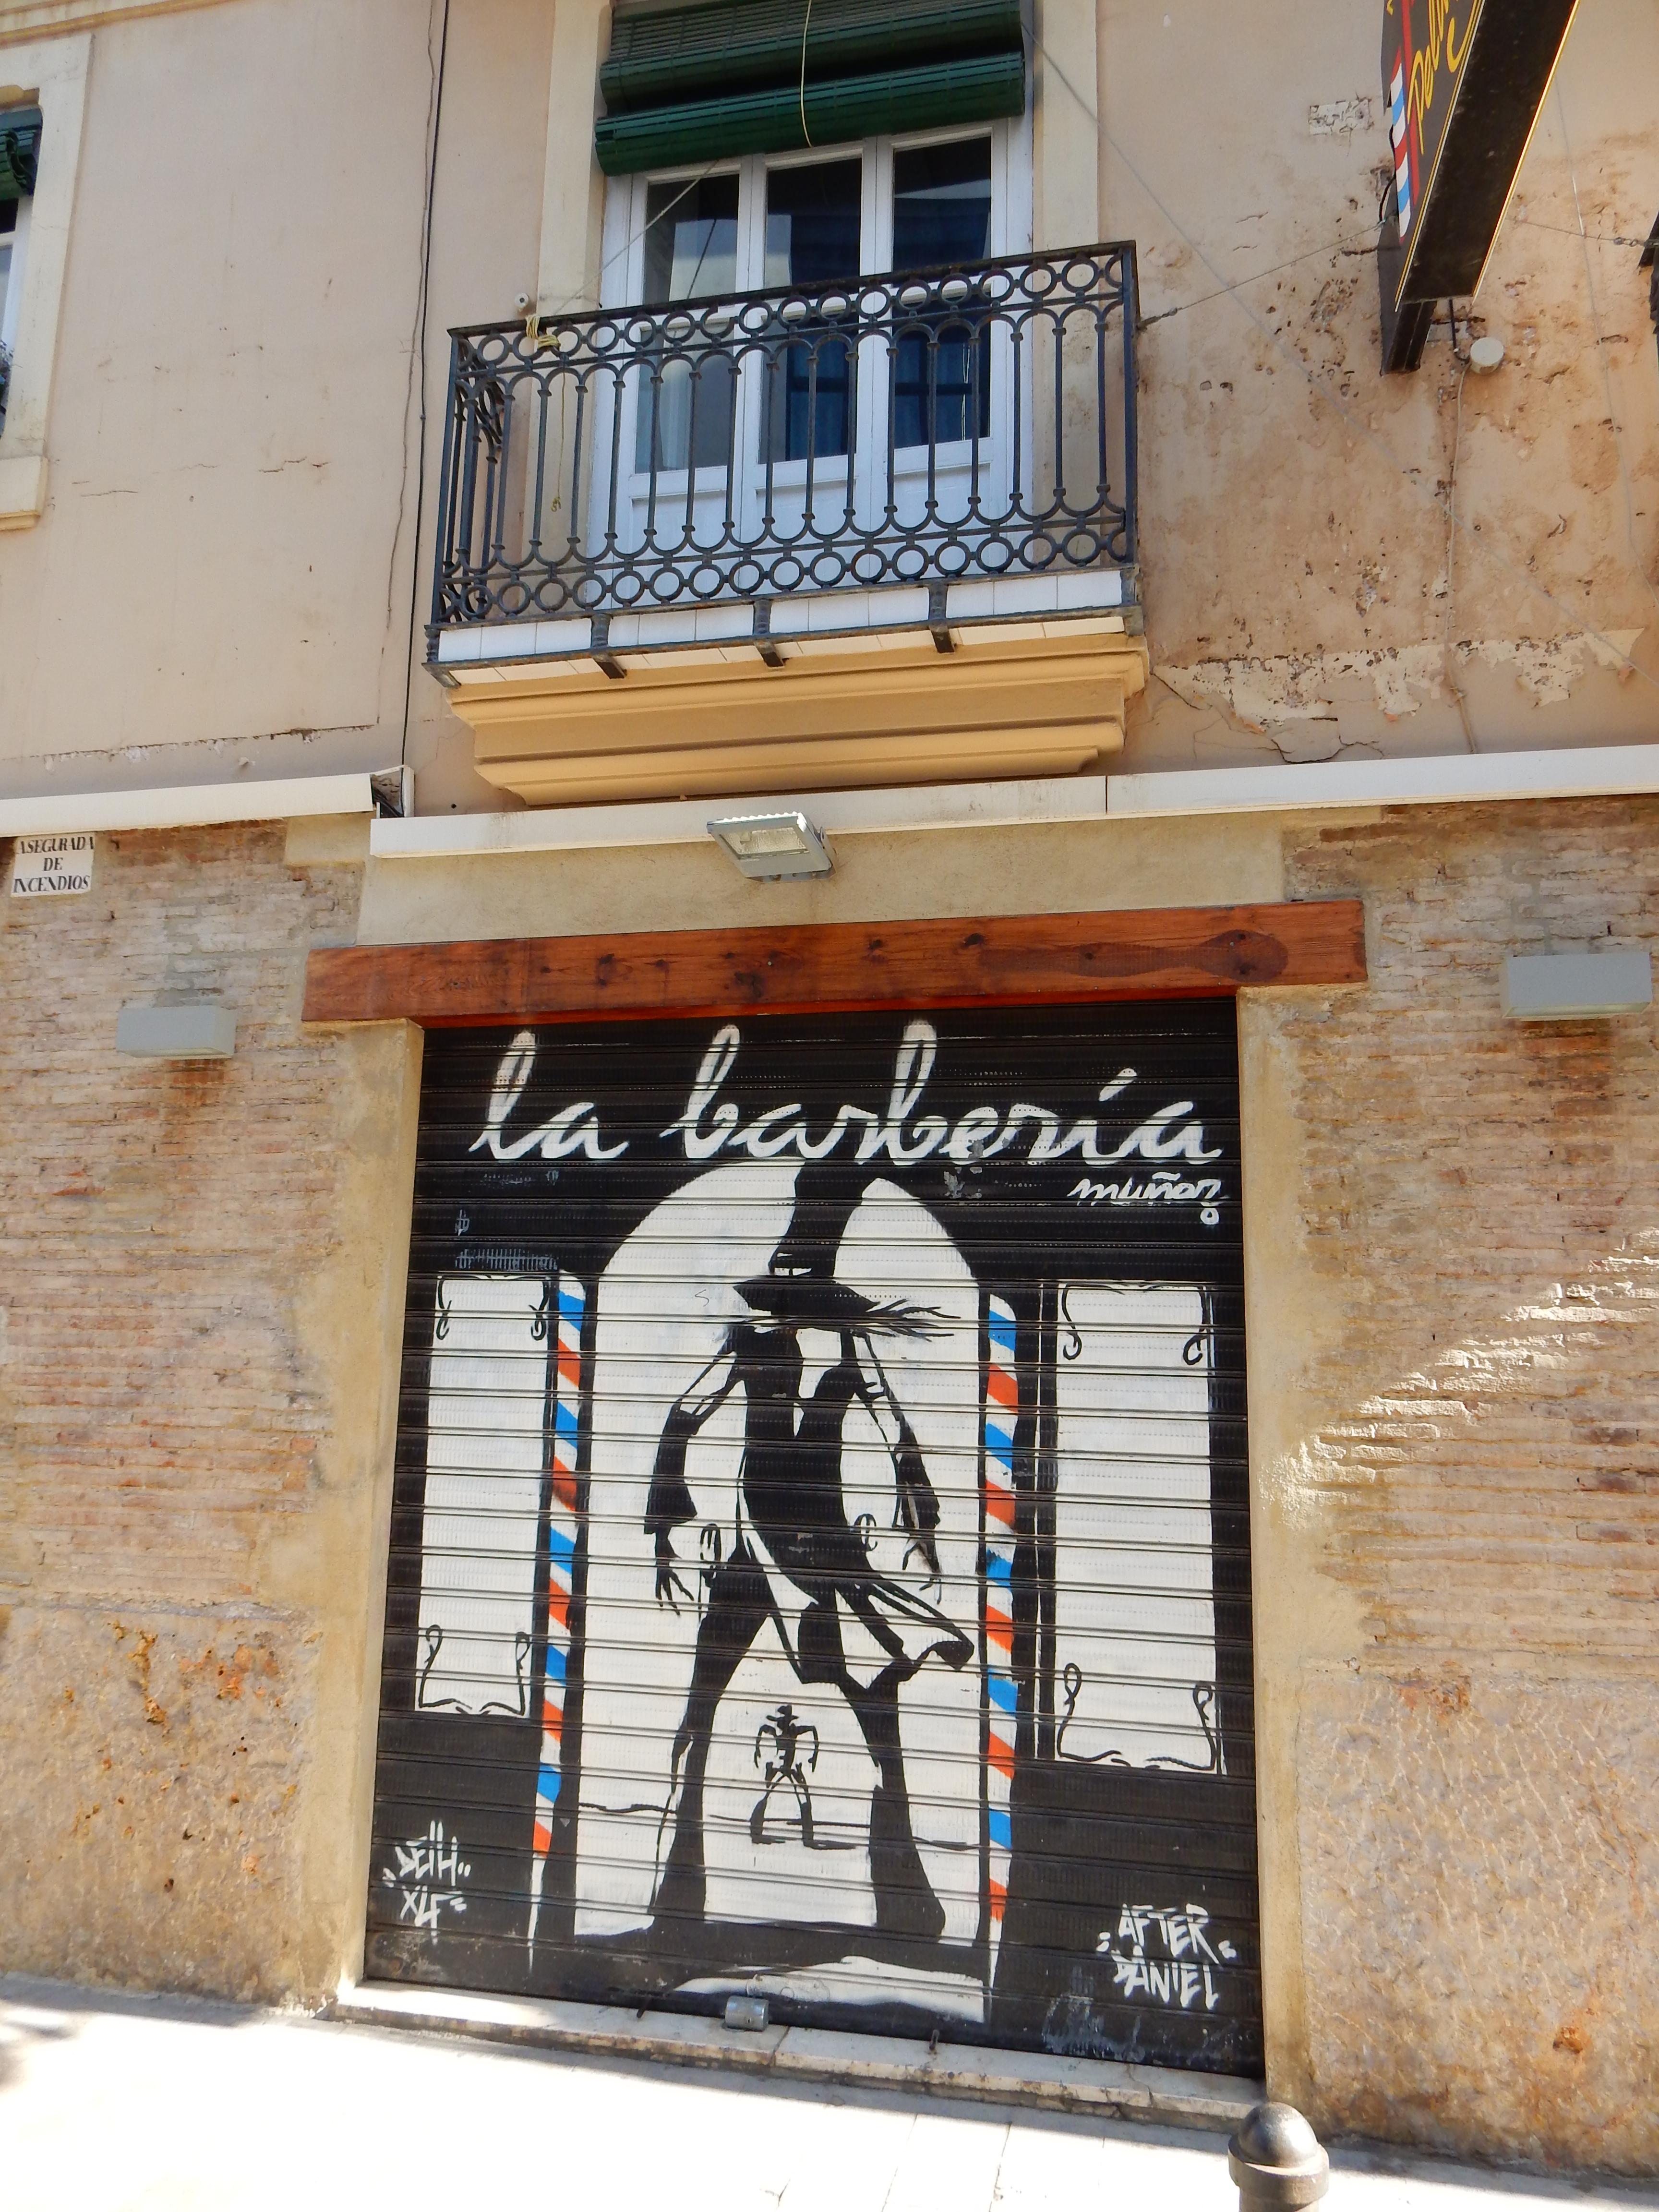 Valencia, Spain (26433428572).jpg Valencia, Spain Date 30 January 2016, 07:57 Source Valencia, Spain Author Brett Hodnett